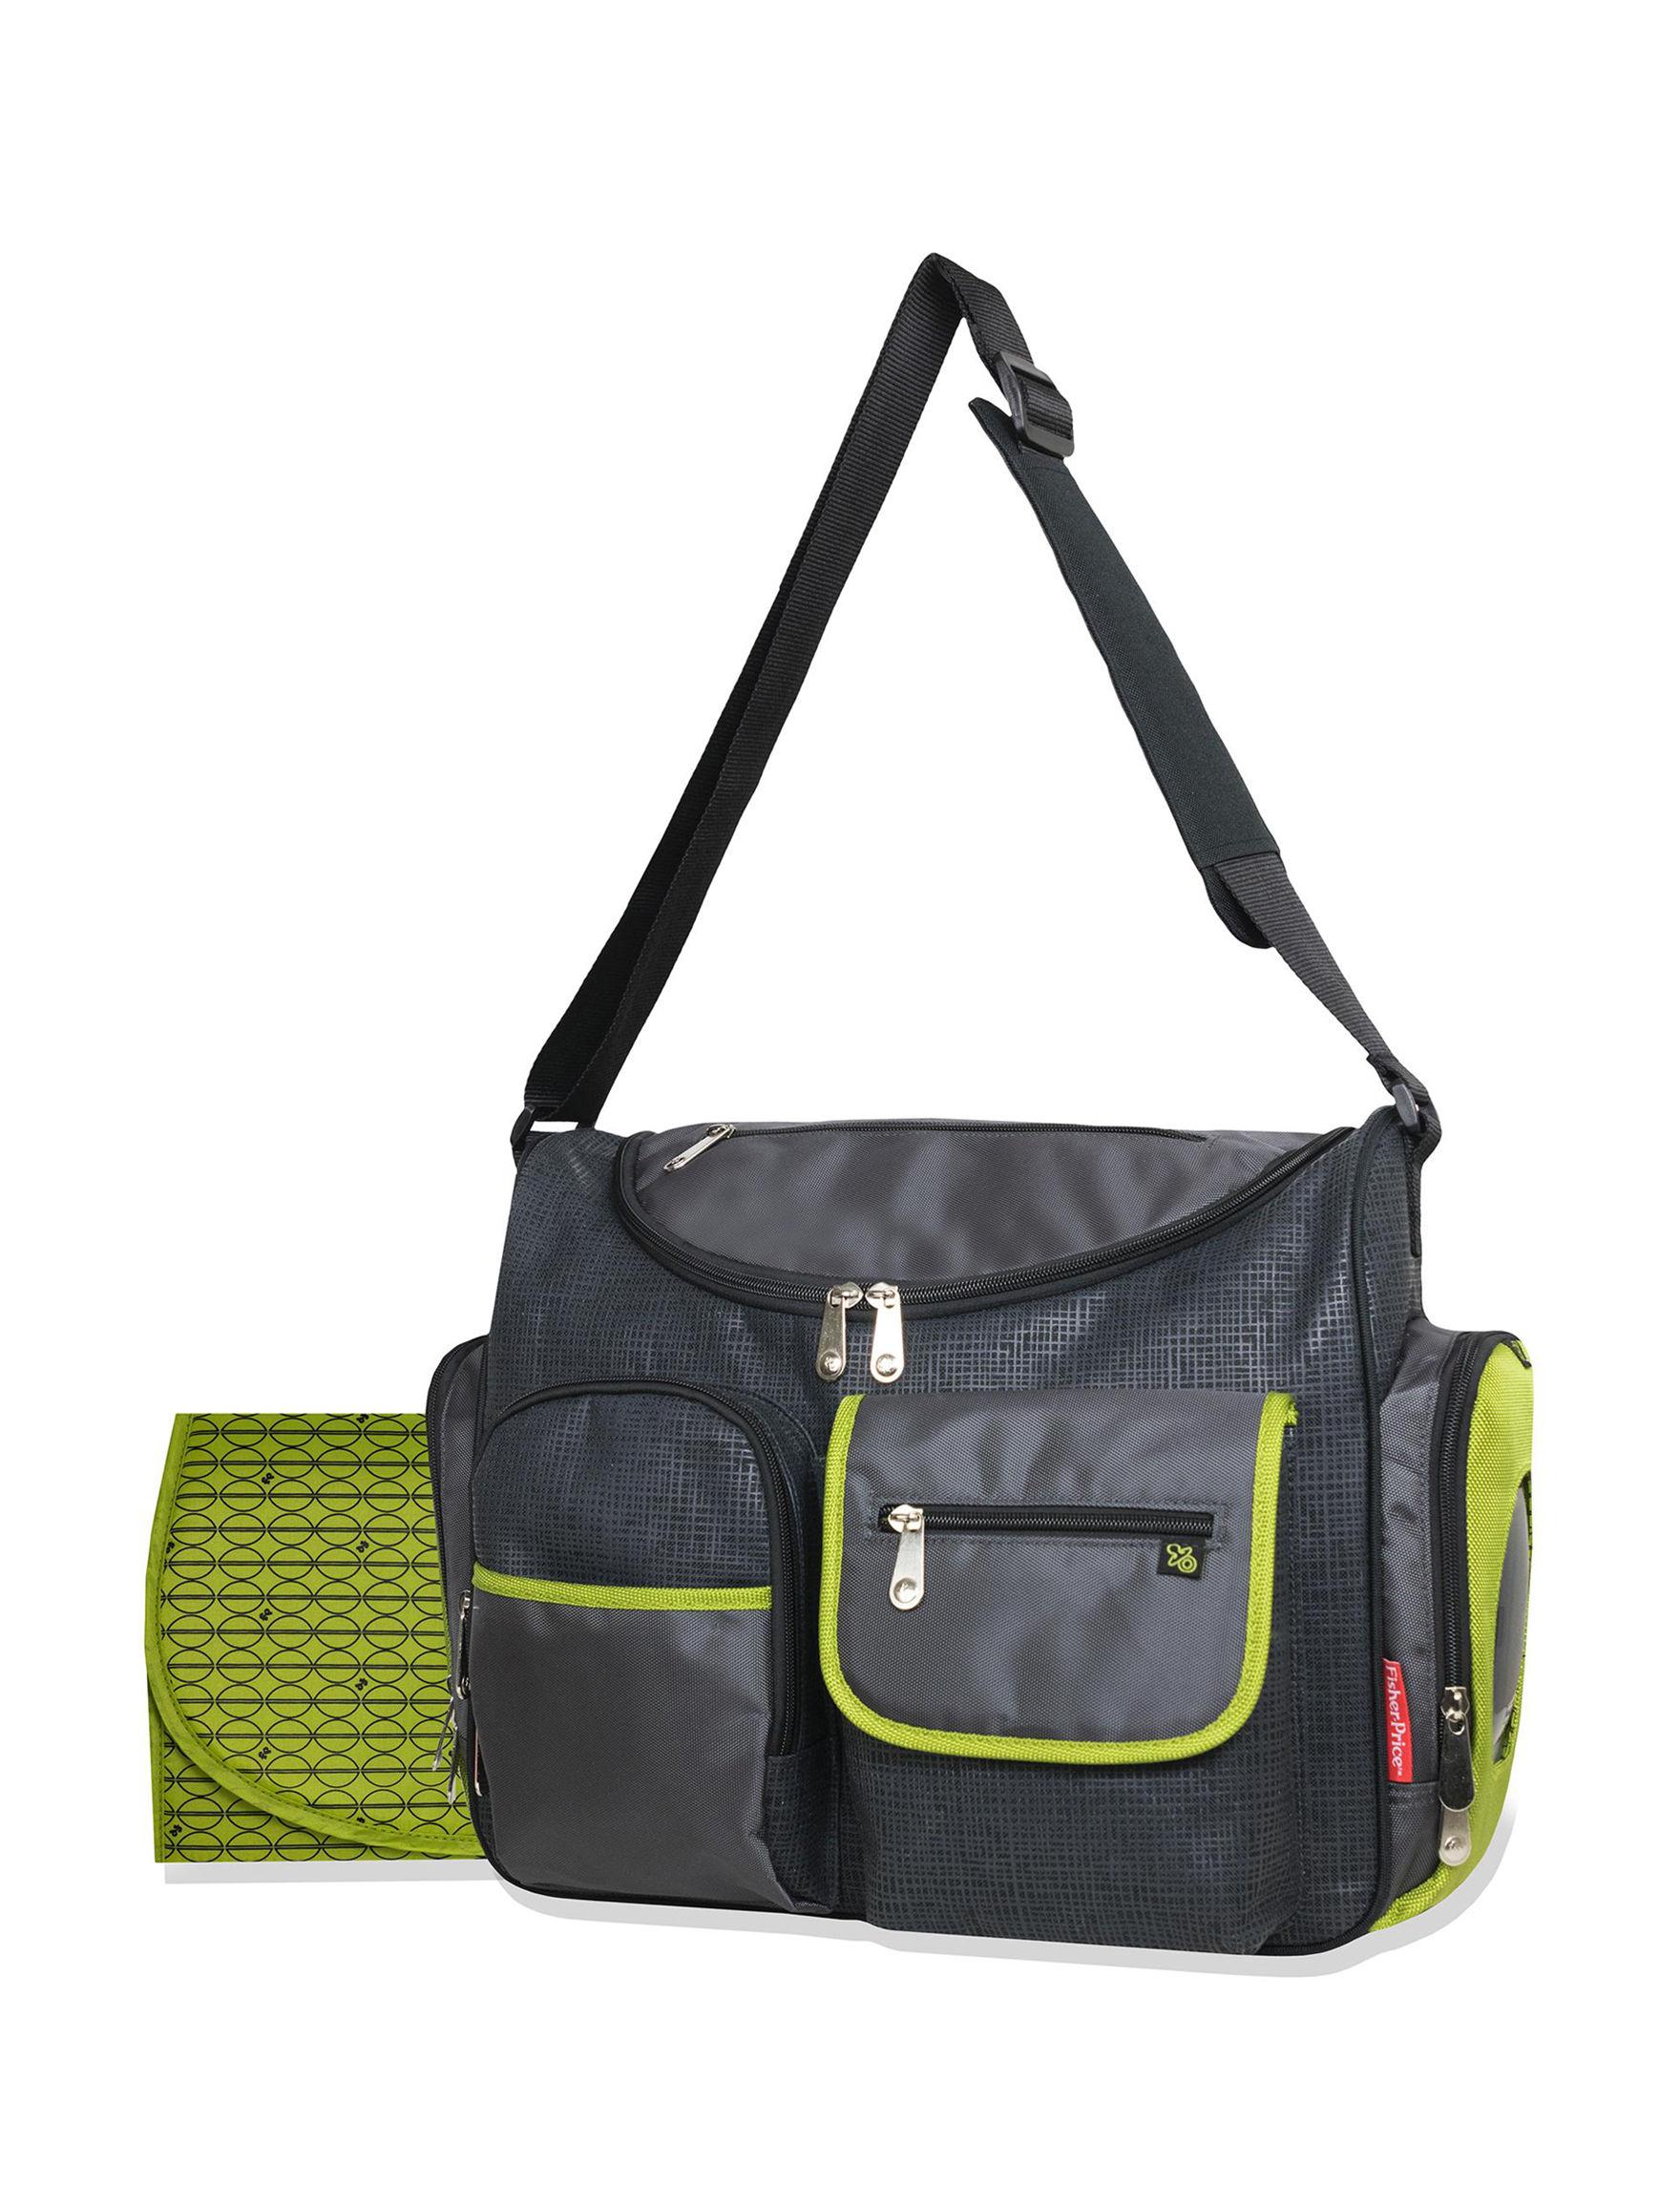 Fisher-Price Grey Diaper Bags